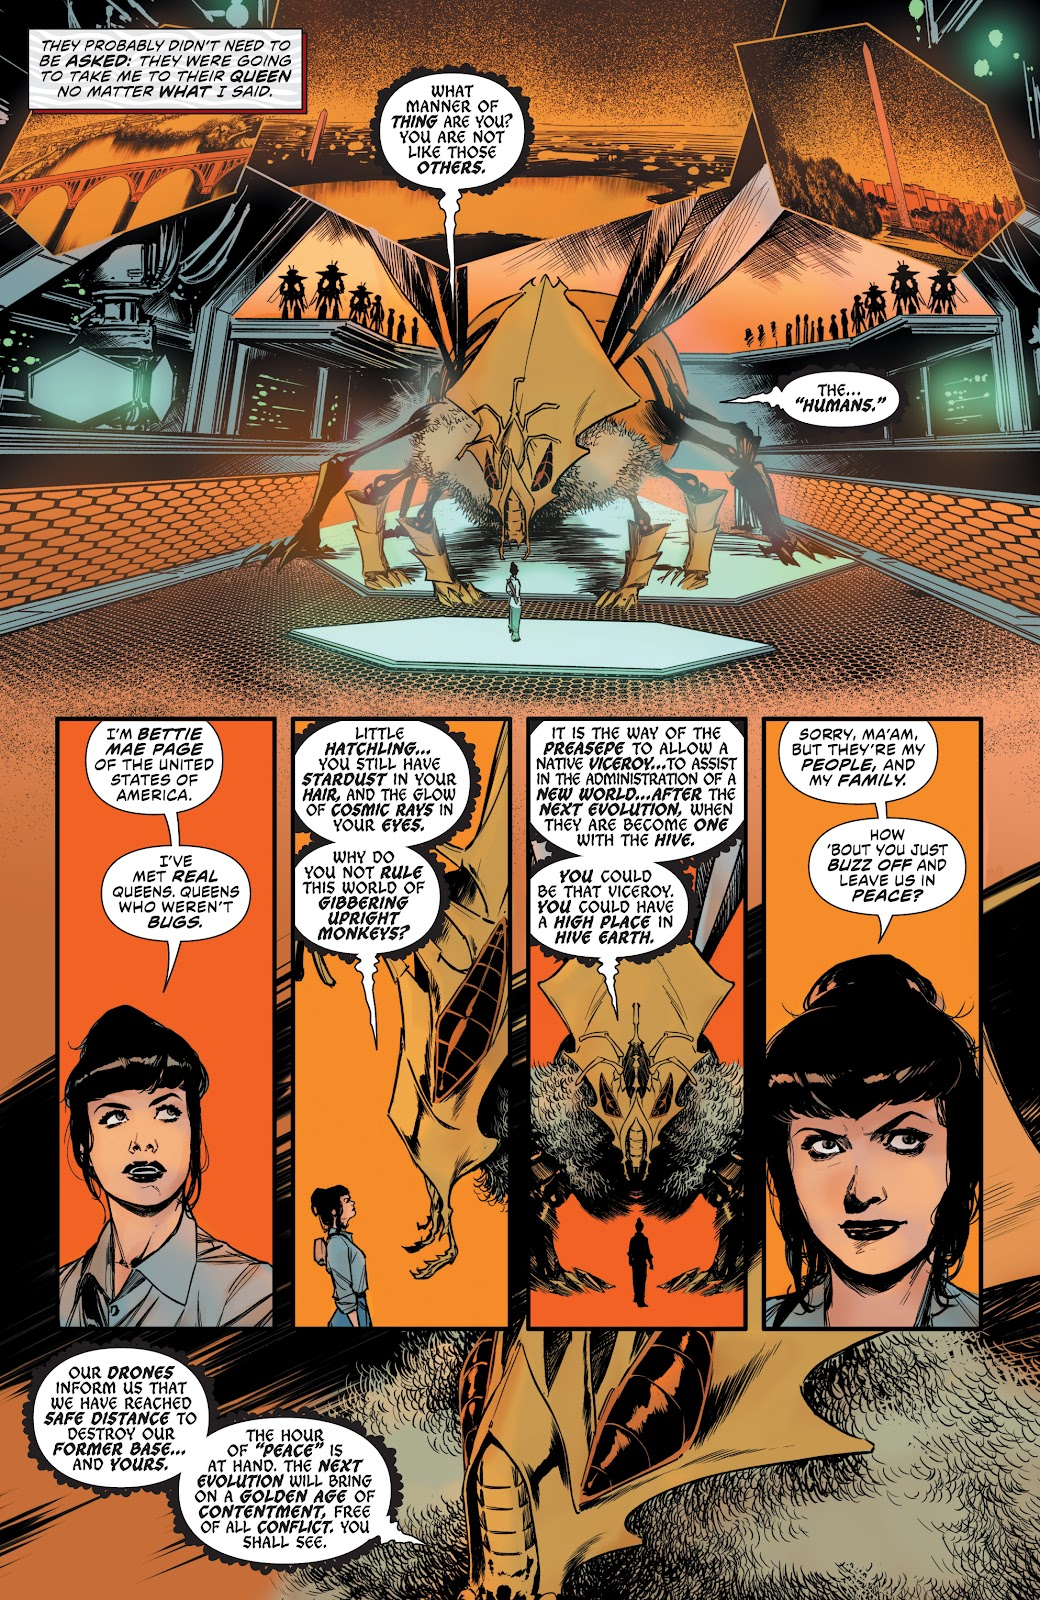 Read online Bettie Page: Unbound comic -  Issue #10 - 21